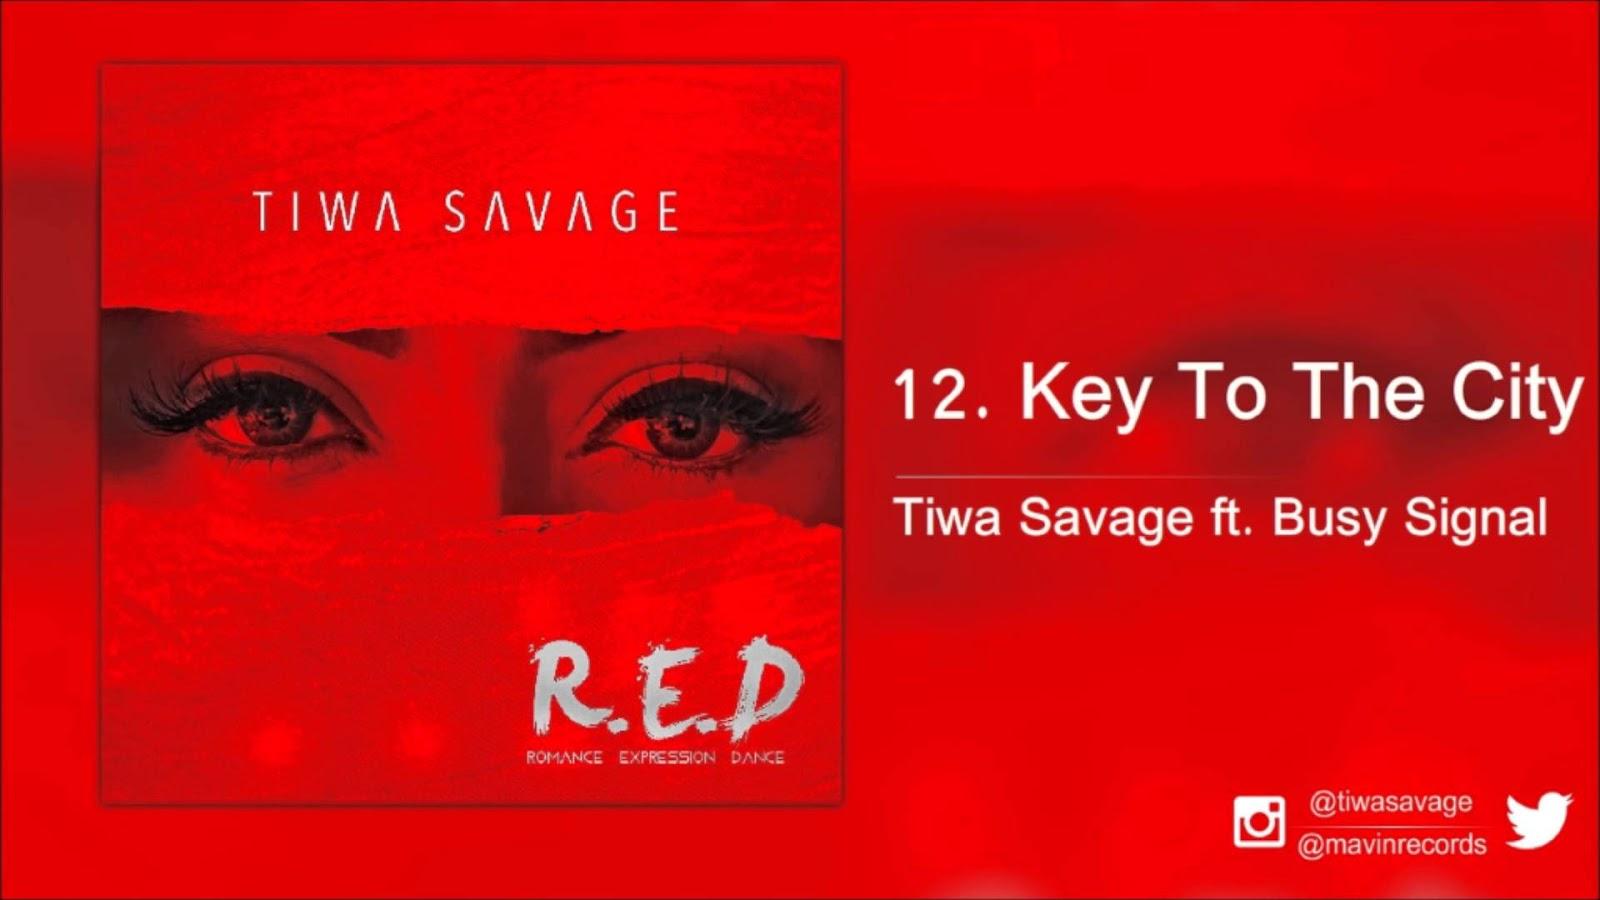 TIWA SAVAGE ft  BUSY SIGNAL - Keys To The City Remix lyrics